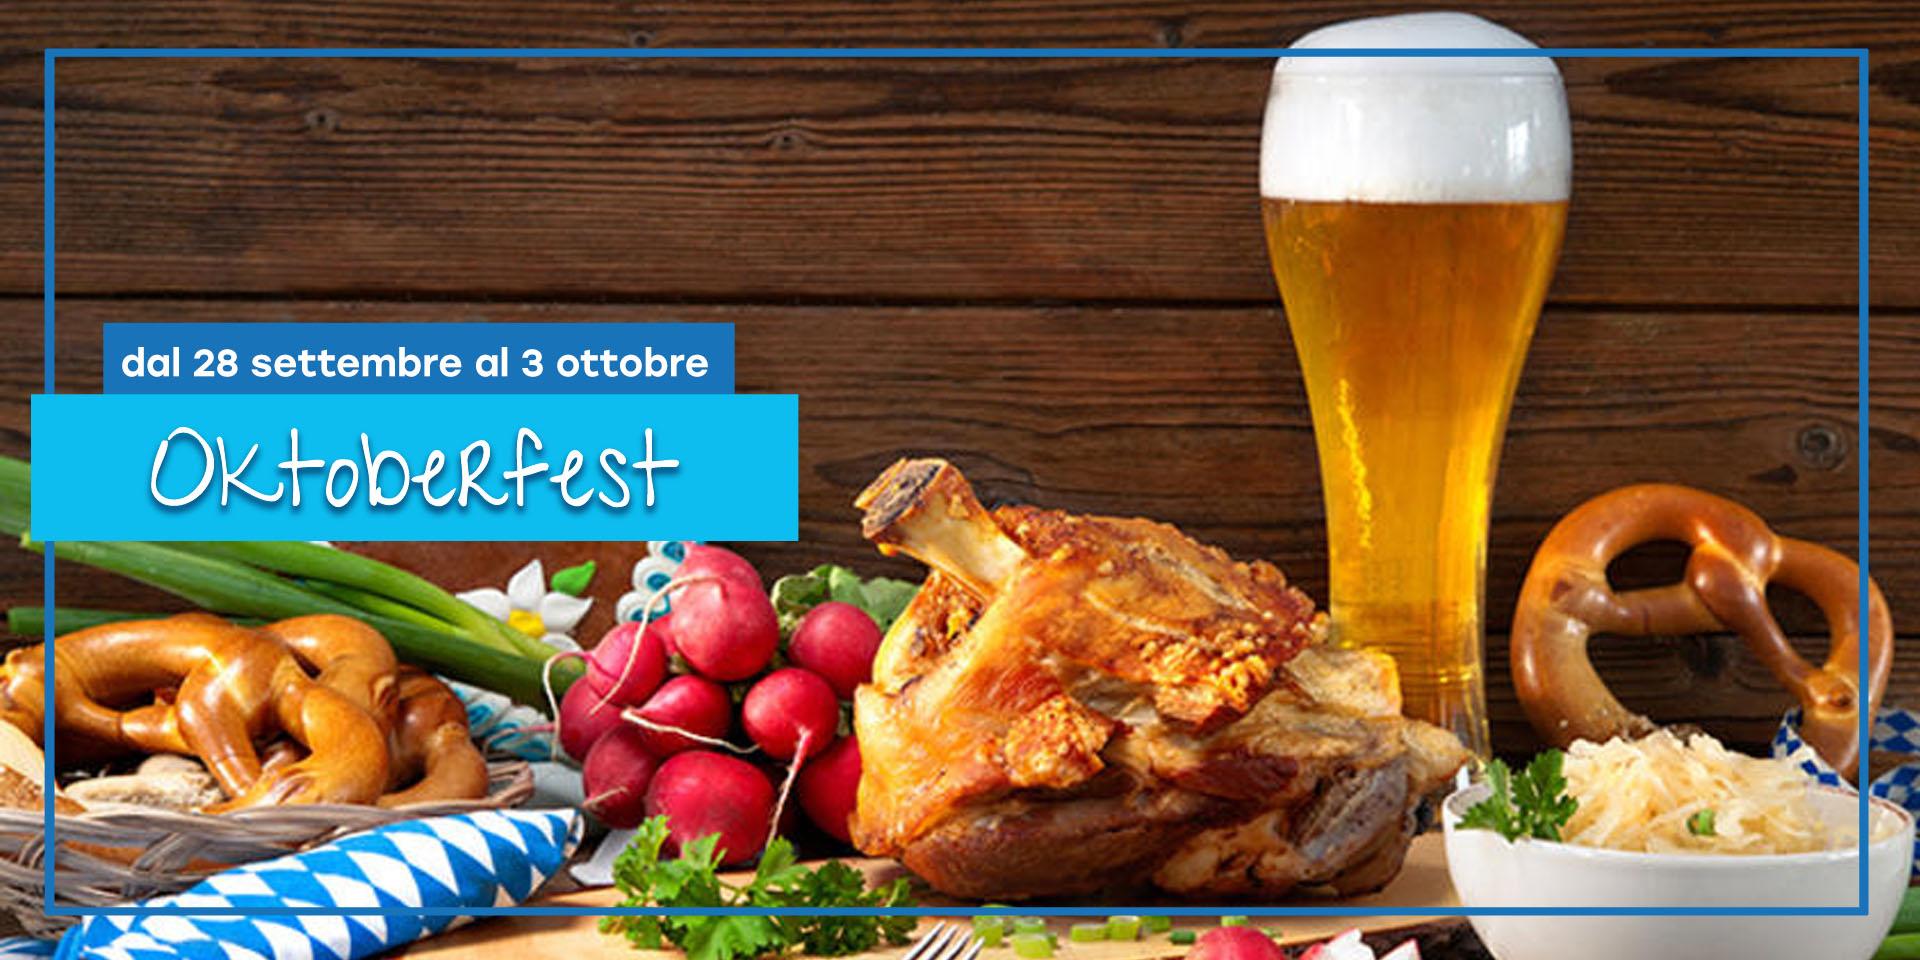 Oktoberfest da Gnam! || dal 28 settembre al 3 ottobre